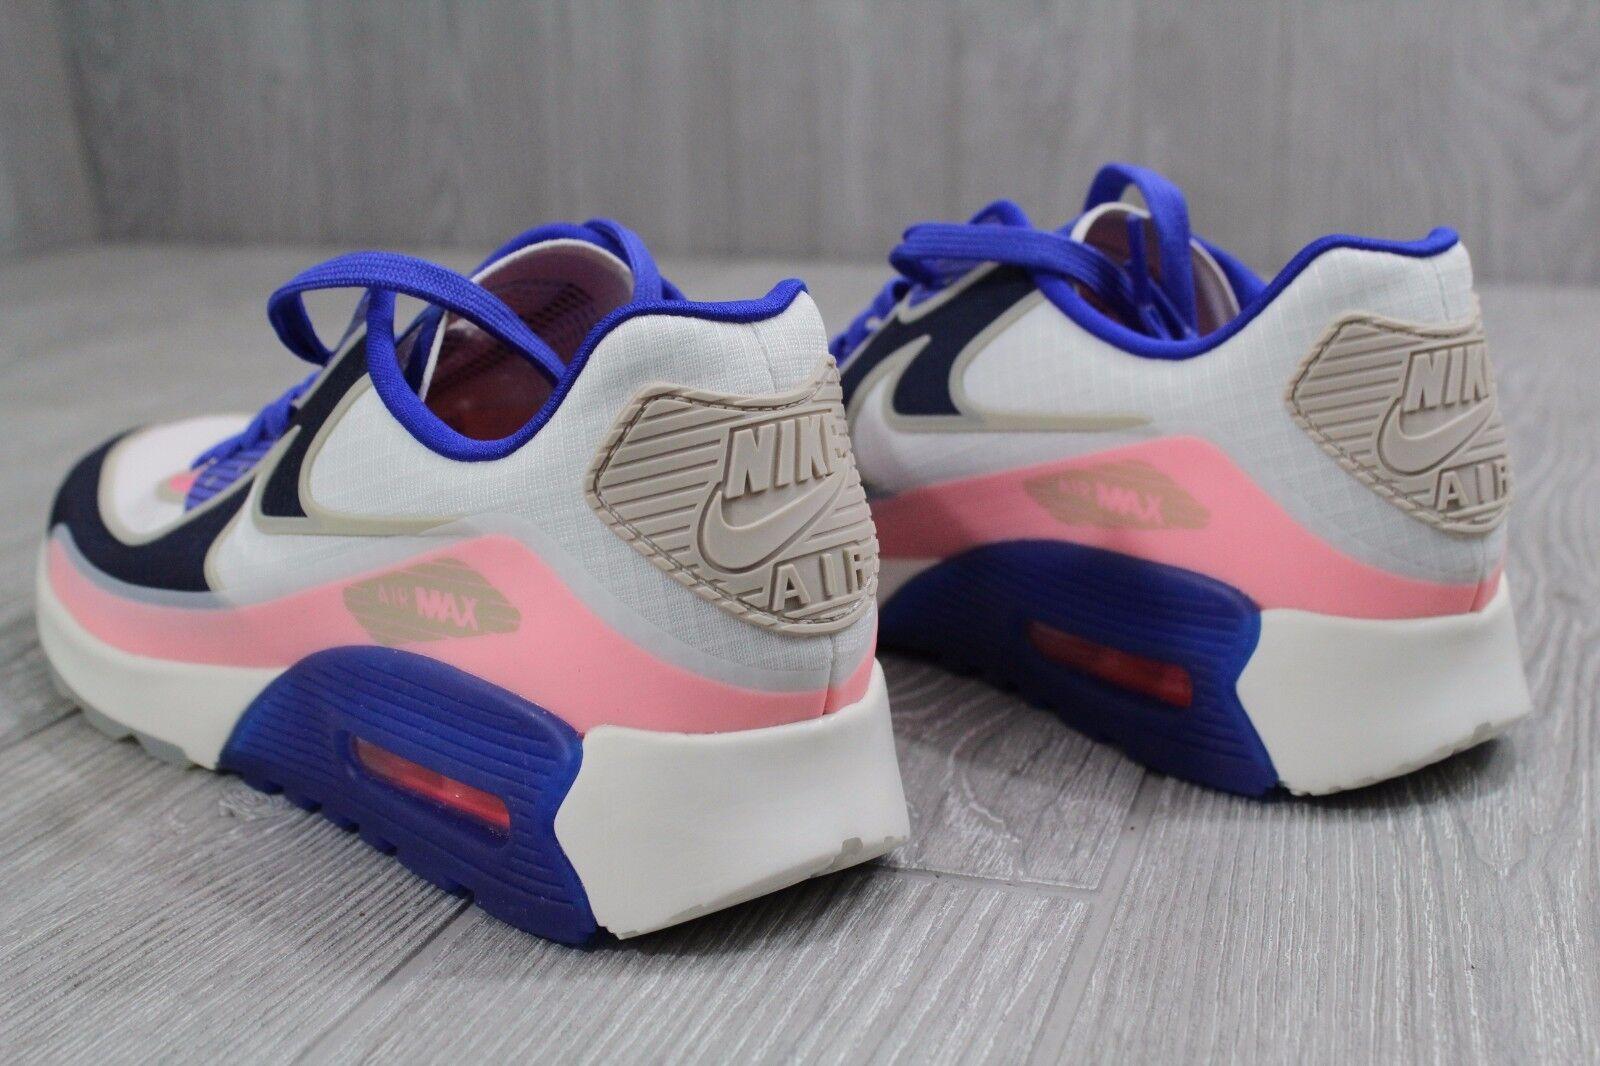 pretty nice b9c0a 20285 ... 21 New Womens Nike Air Max 90 Ultra 2.0 2.0 2.0 SI Blue Running Shoes  881108 ...